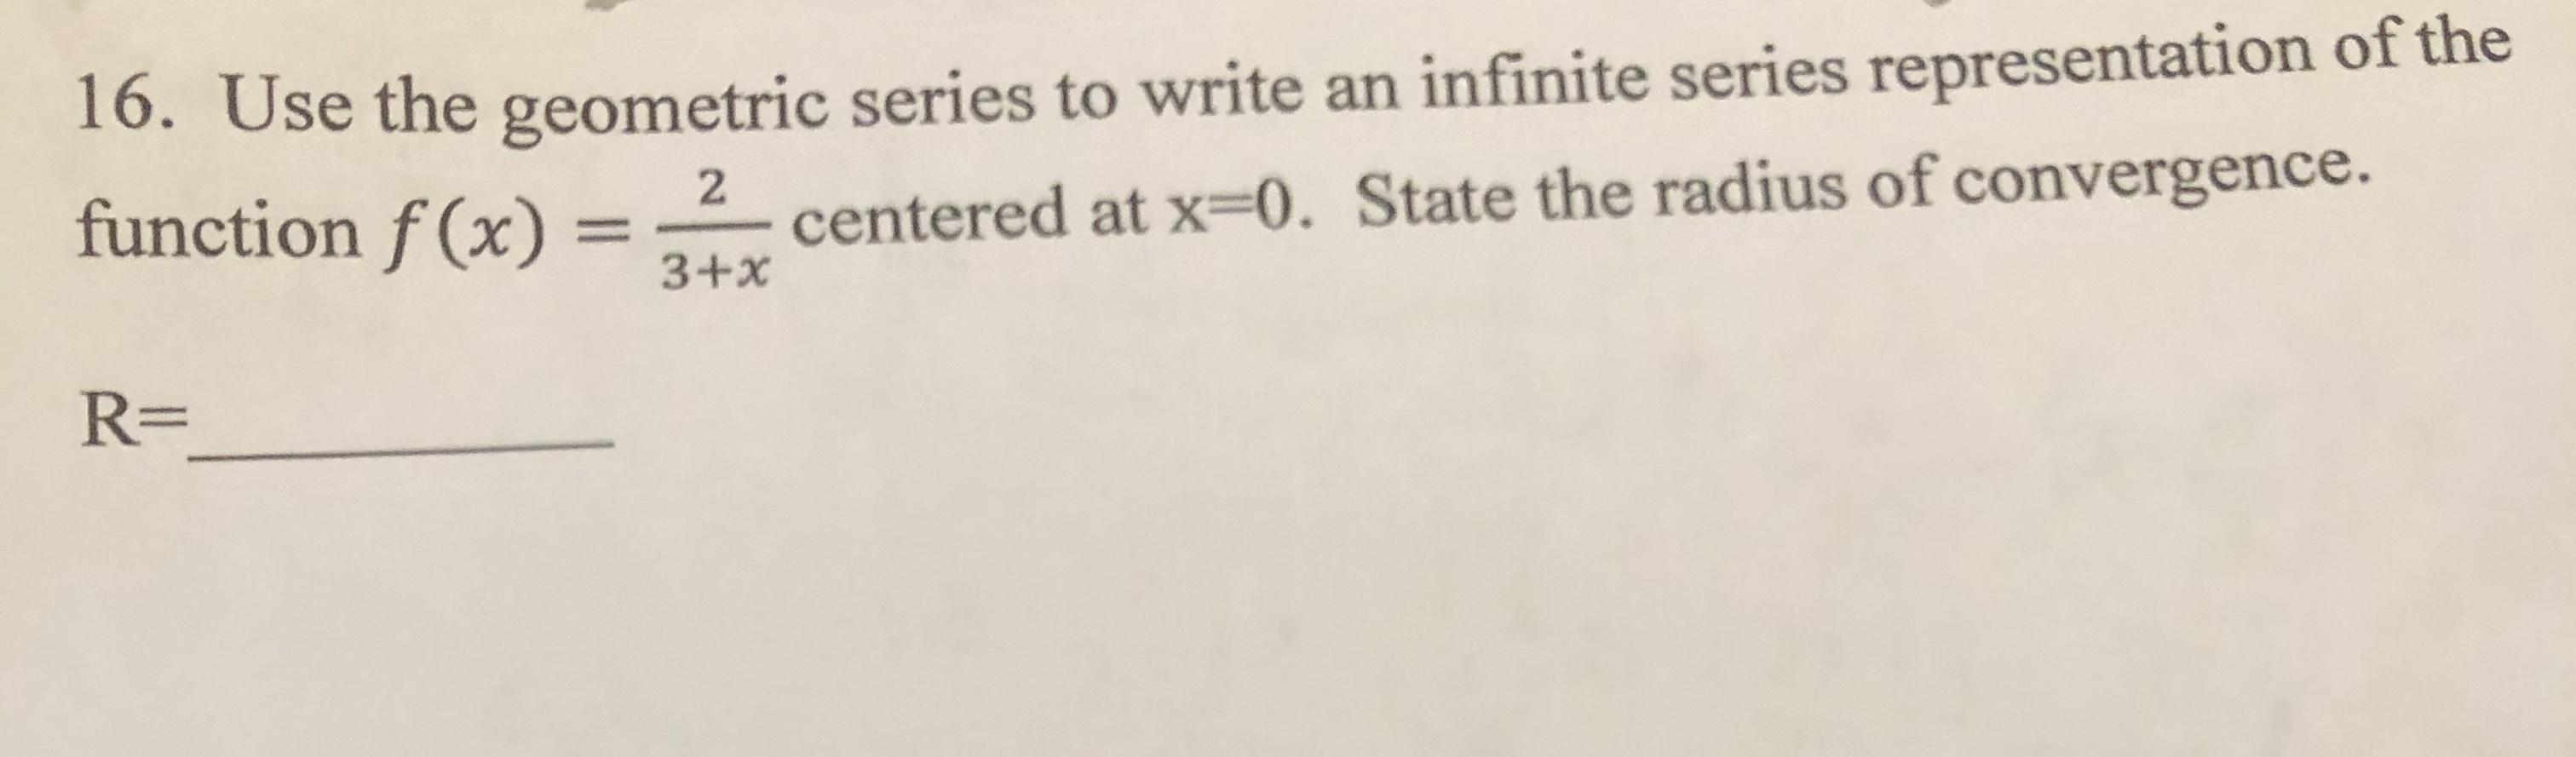 Answered 16 Use The Geometric Series To Write